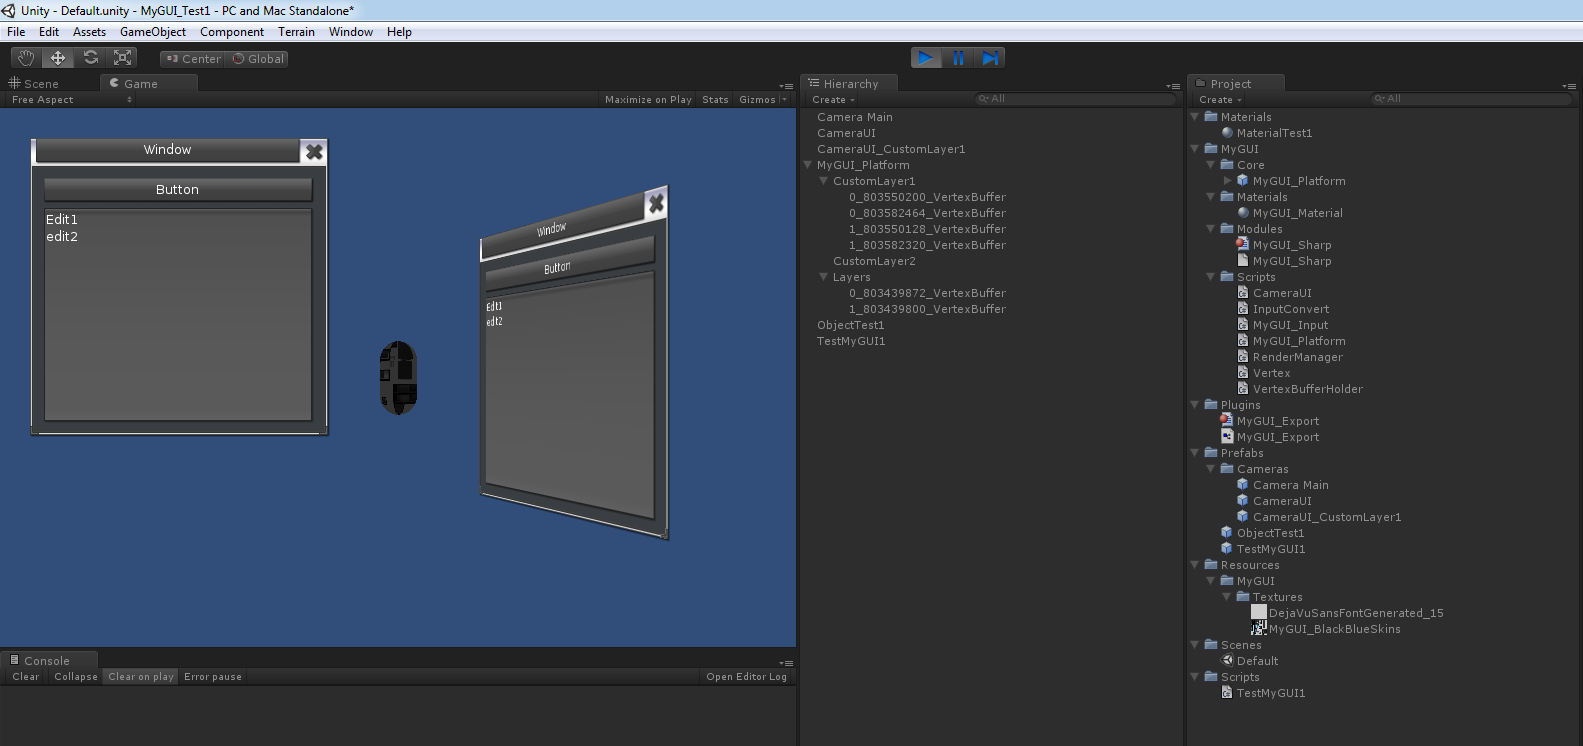 MyGUI_Platform_for_Unity3D_1